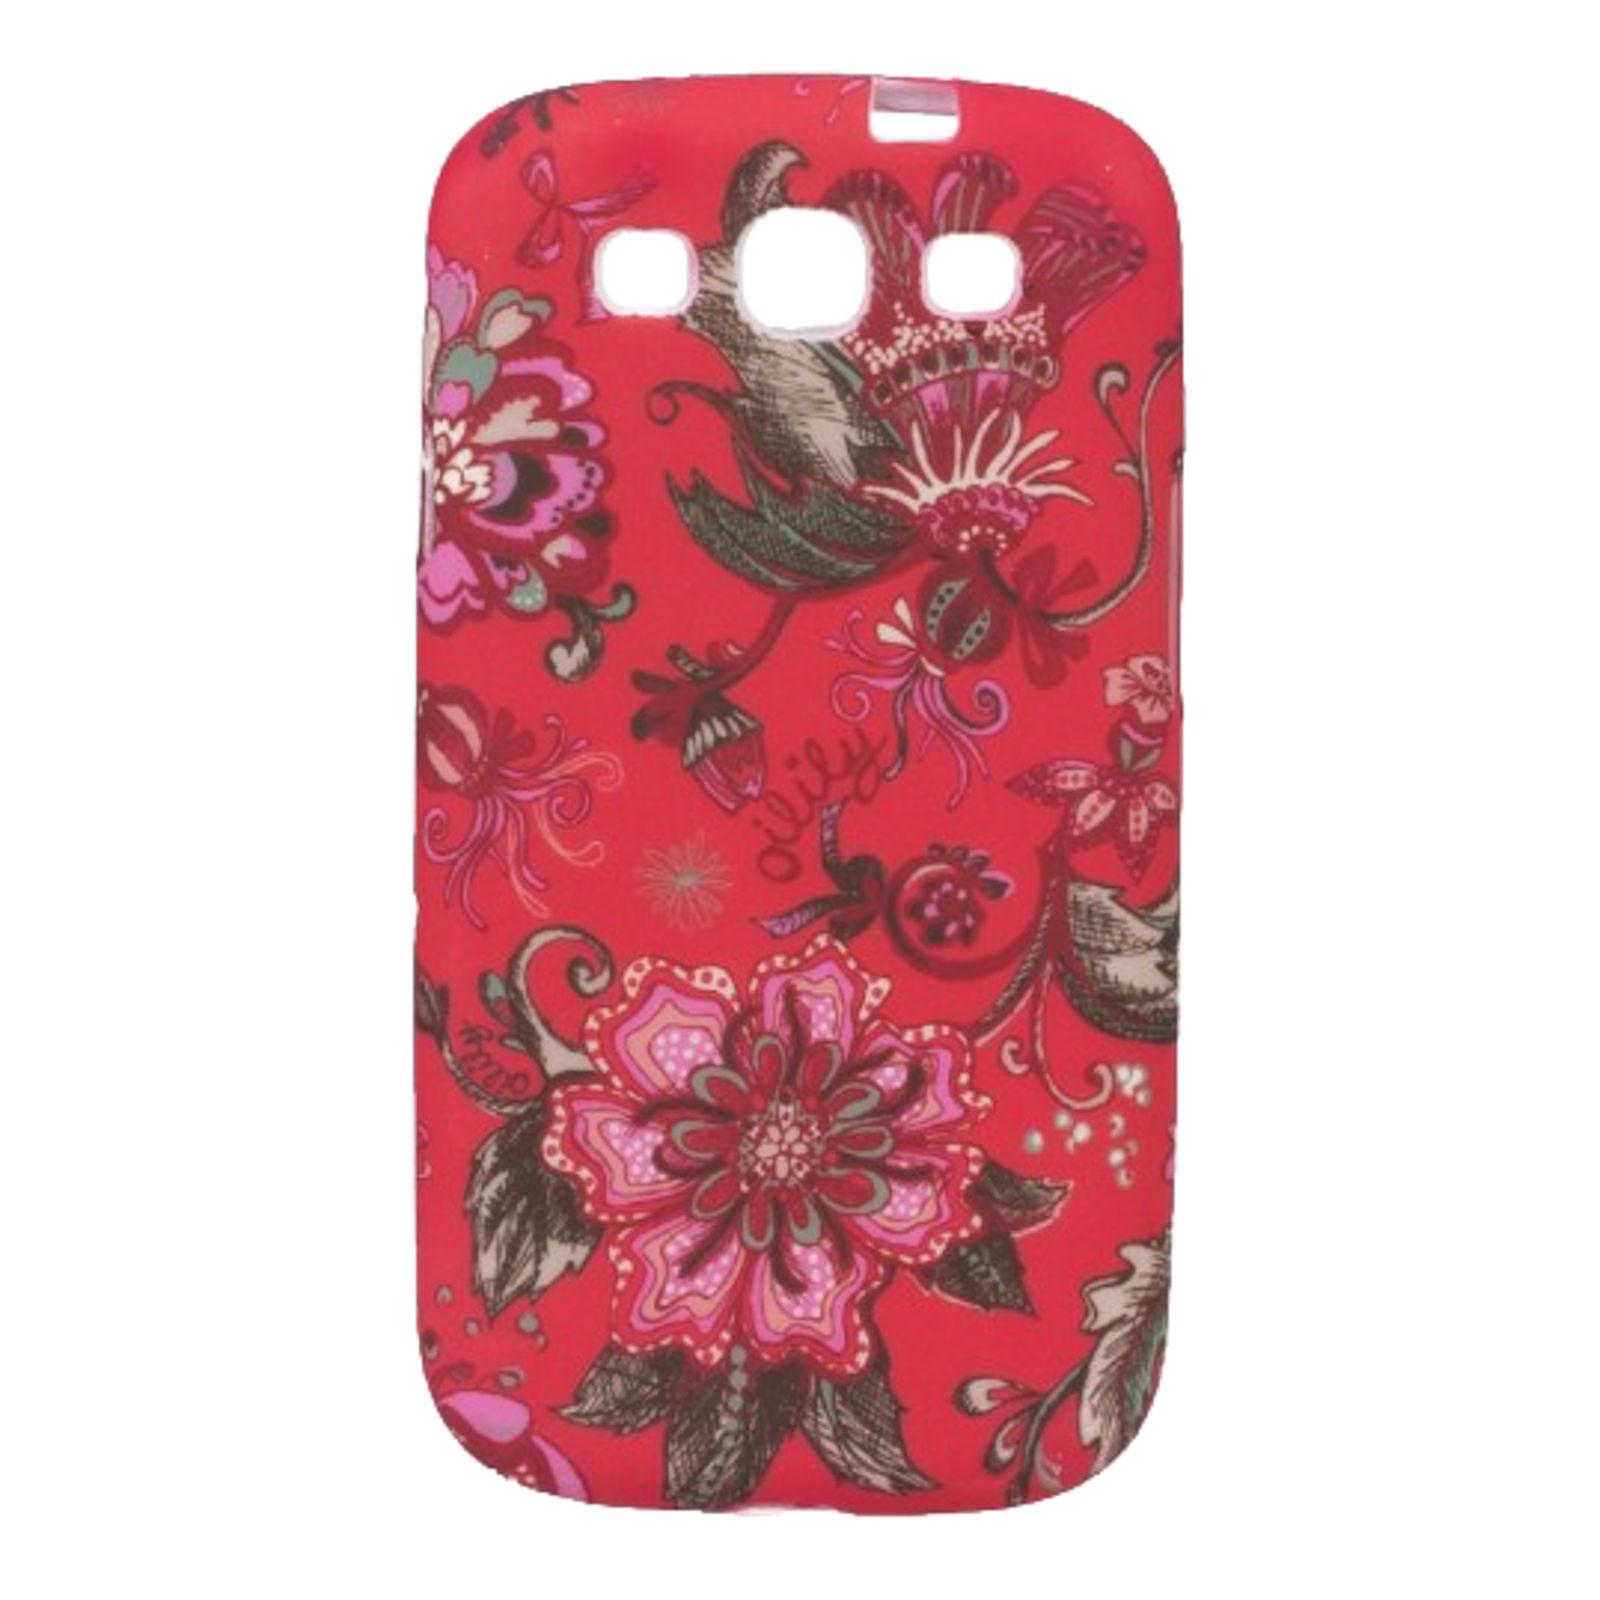 Oilily Sea of Flowers Samsung Galaxy SIII Case Cayenne